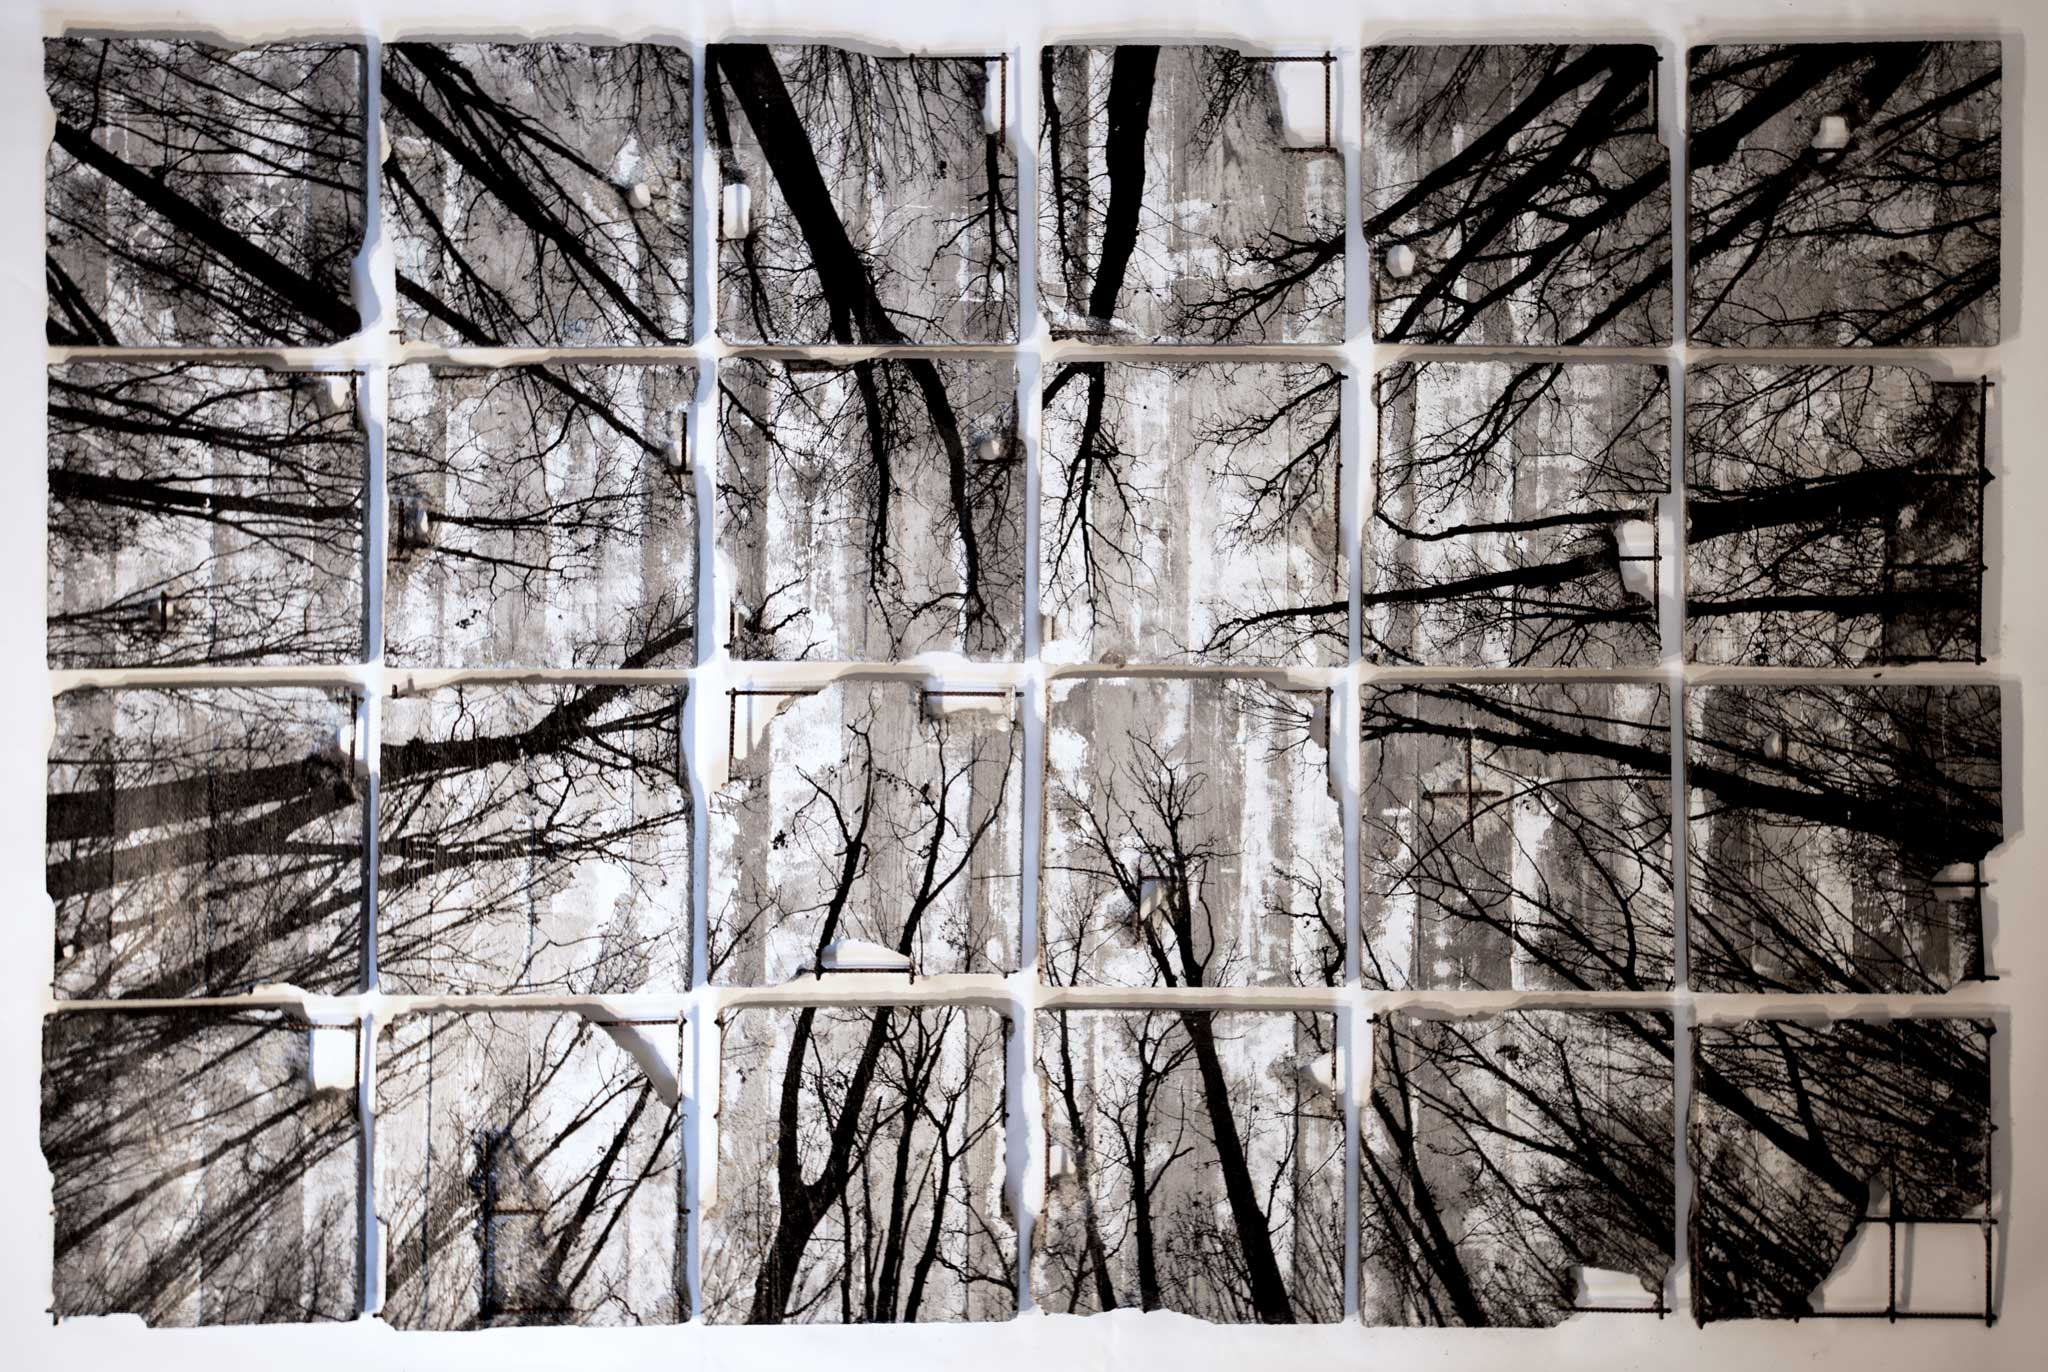 Cemento - vertigine 208 x 138